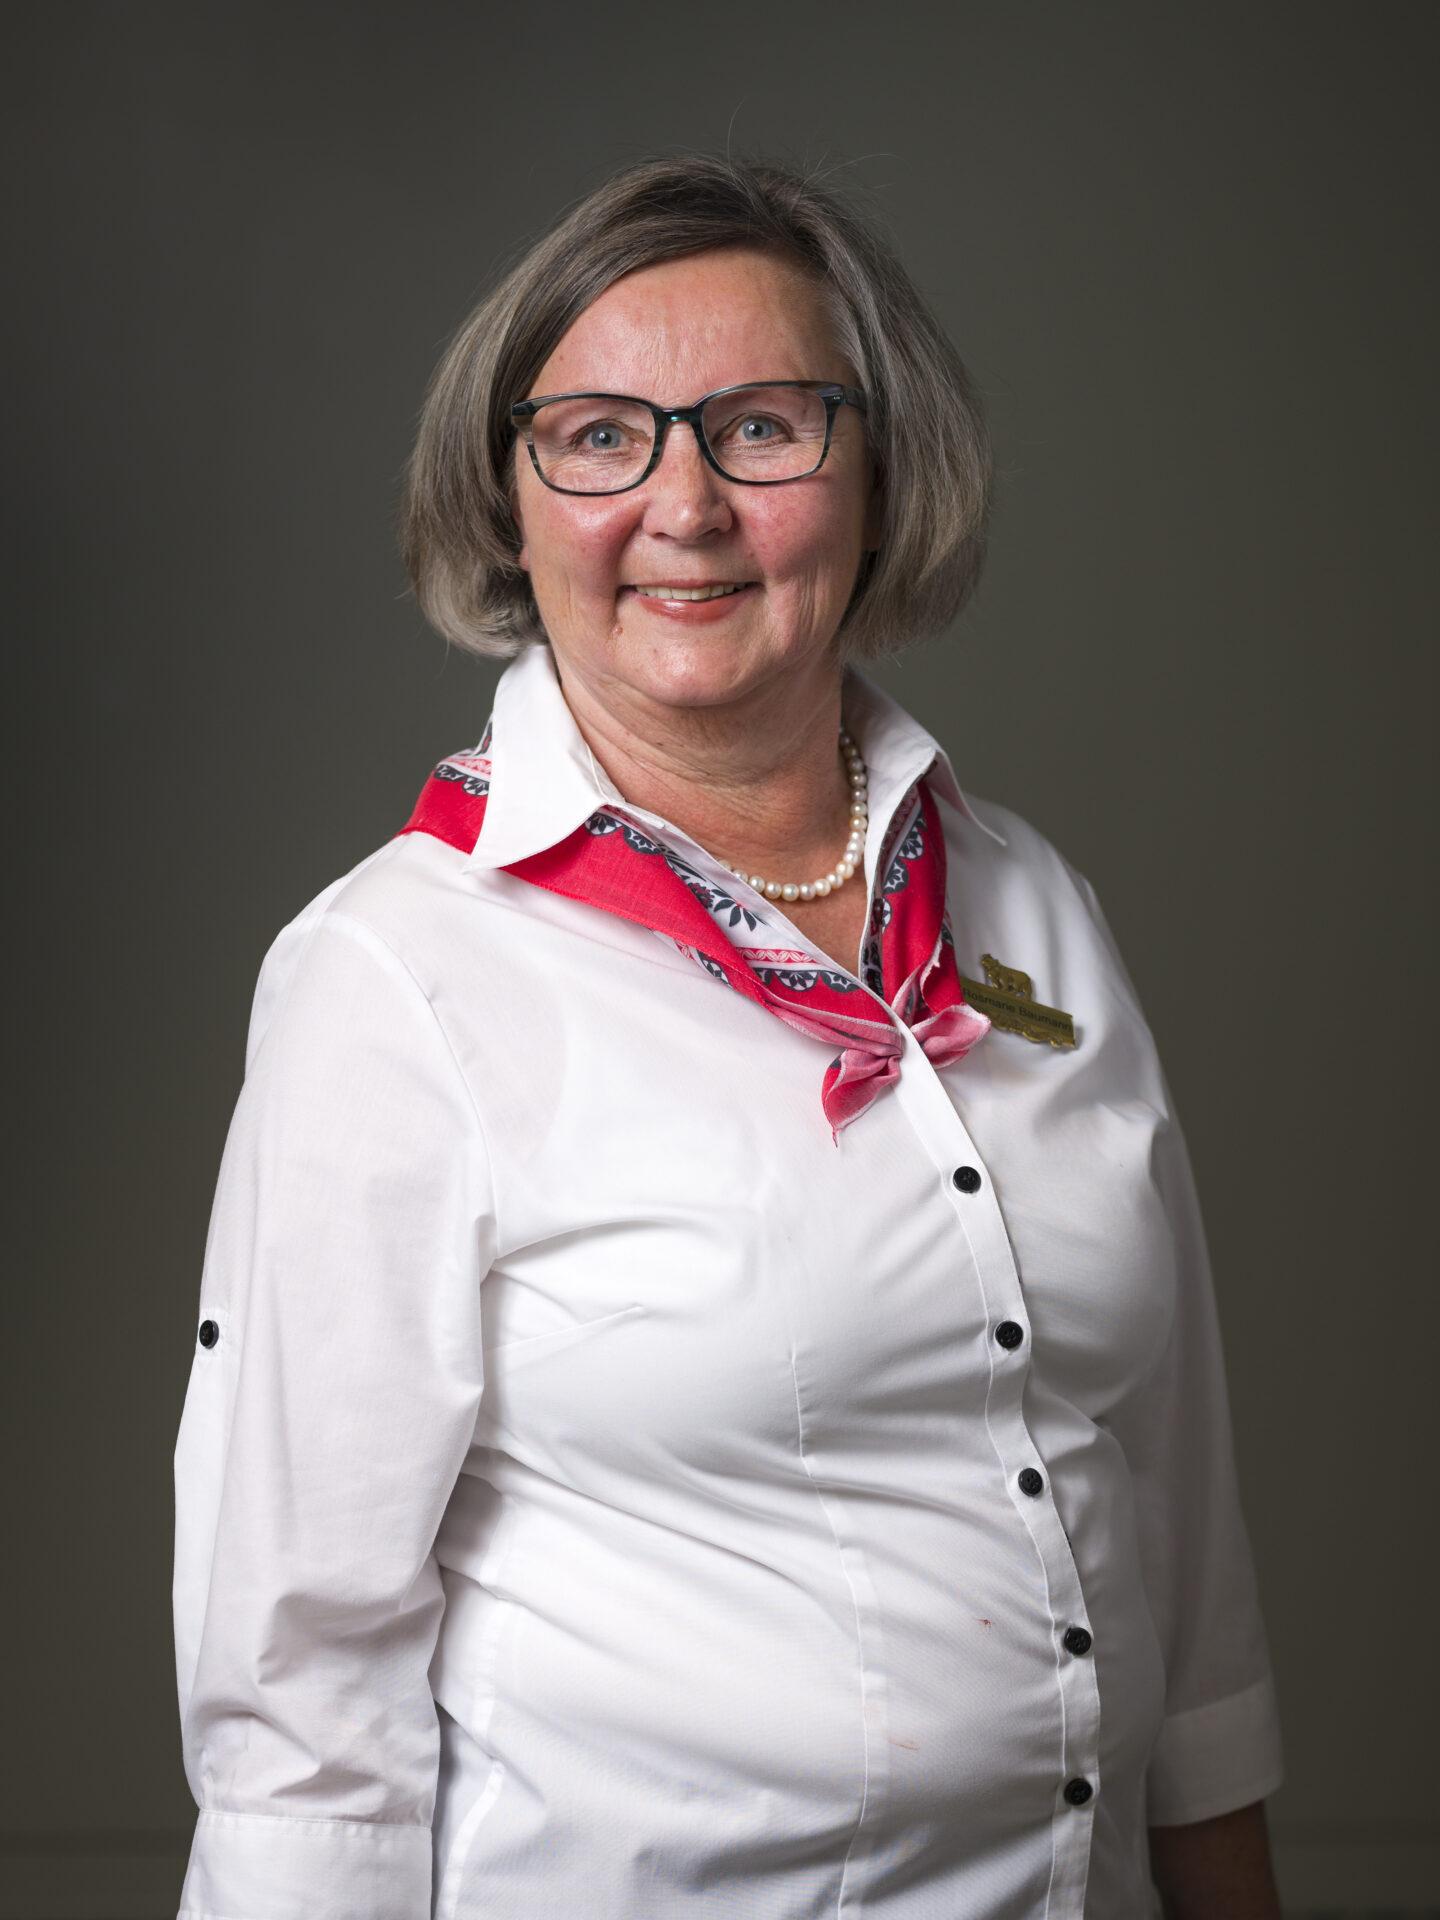 Rosmarie Baumann, Gastgeberin